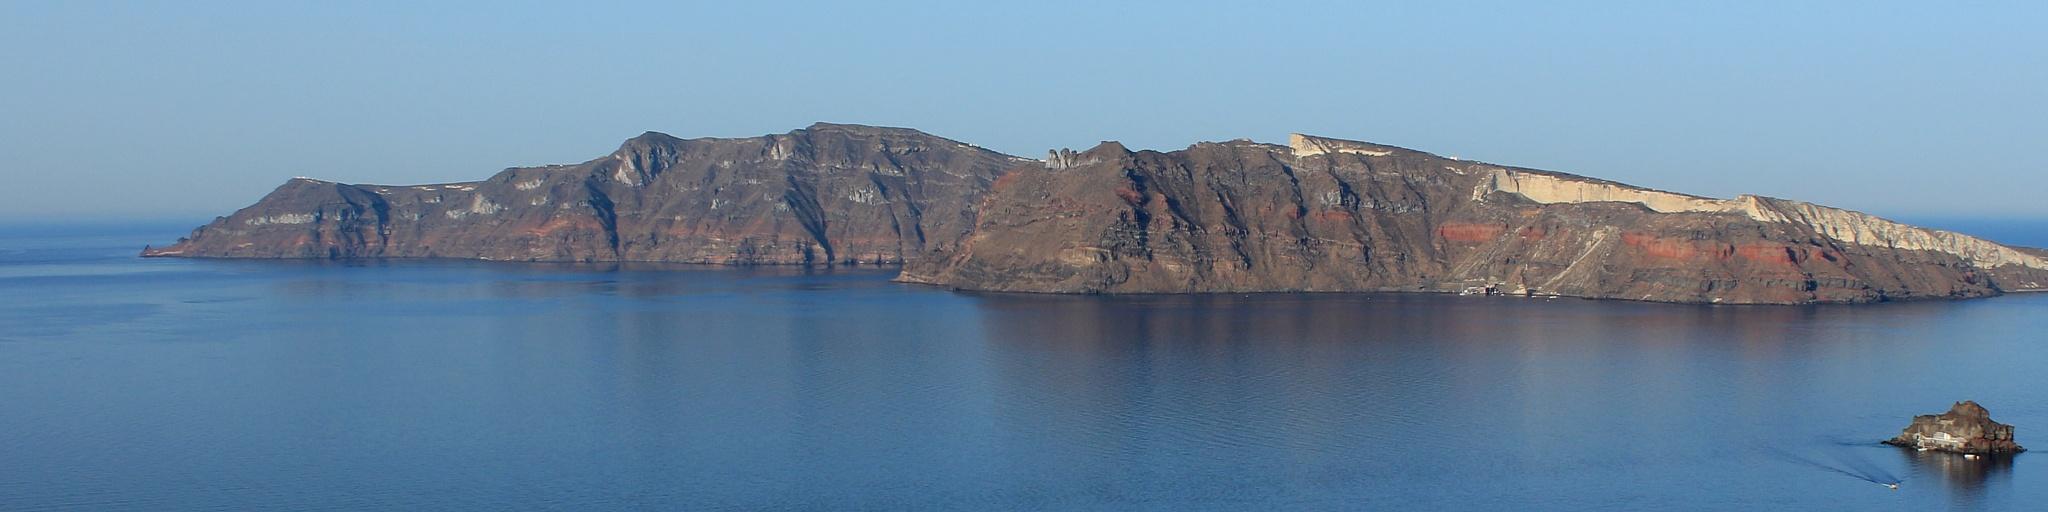 island, Santorini by katze